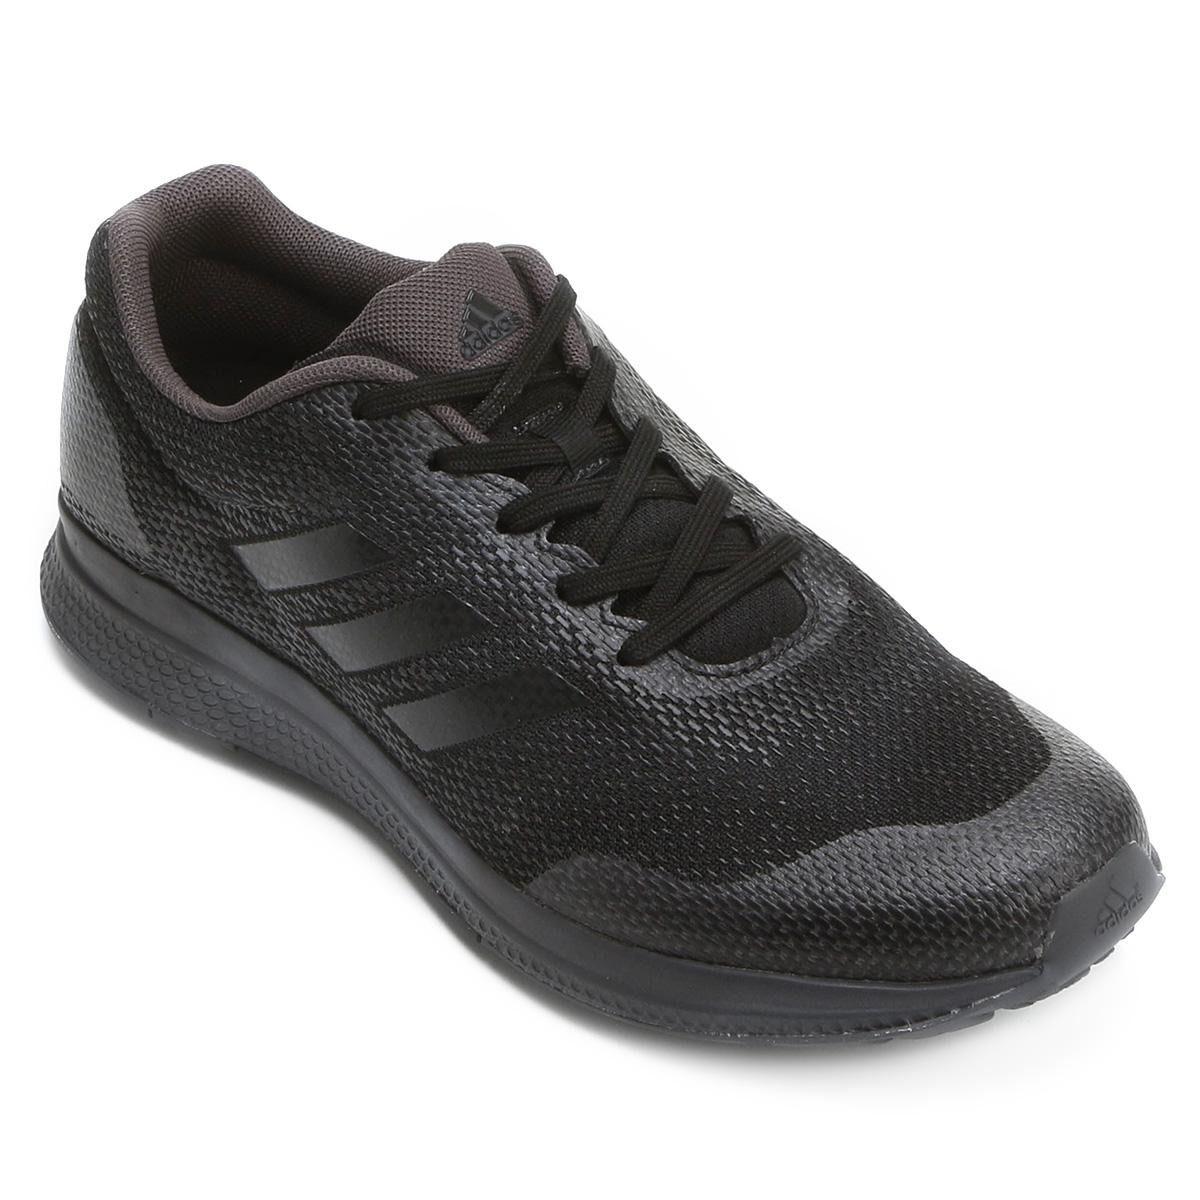 2db7ad700c8 Tênis Masculino Adidas Mana Bounce 2 Aramis - BRACIA SHOP  Loja de ...